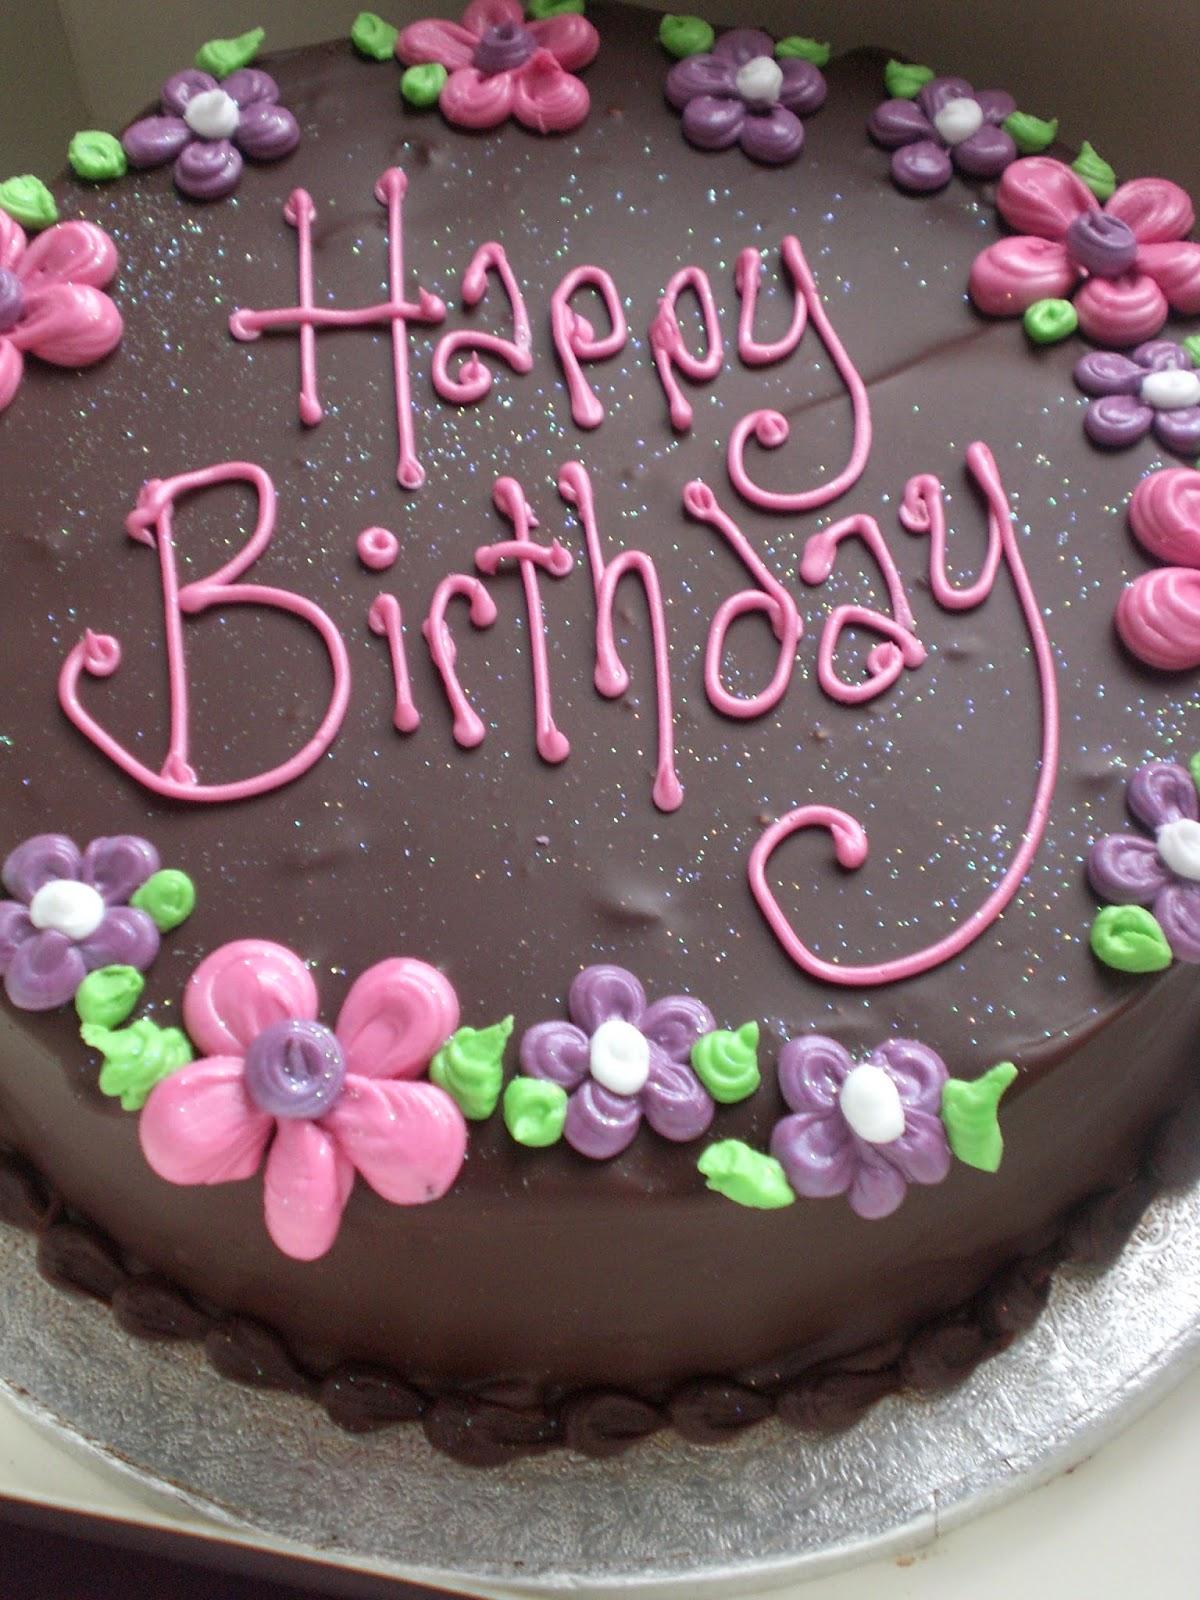 Happy Birthday Cake Yespoetry Wordpress Com